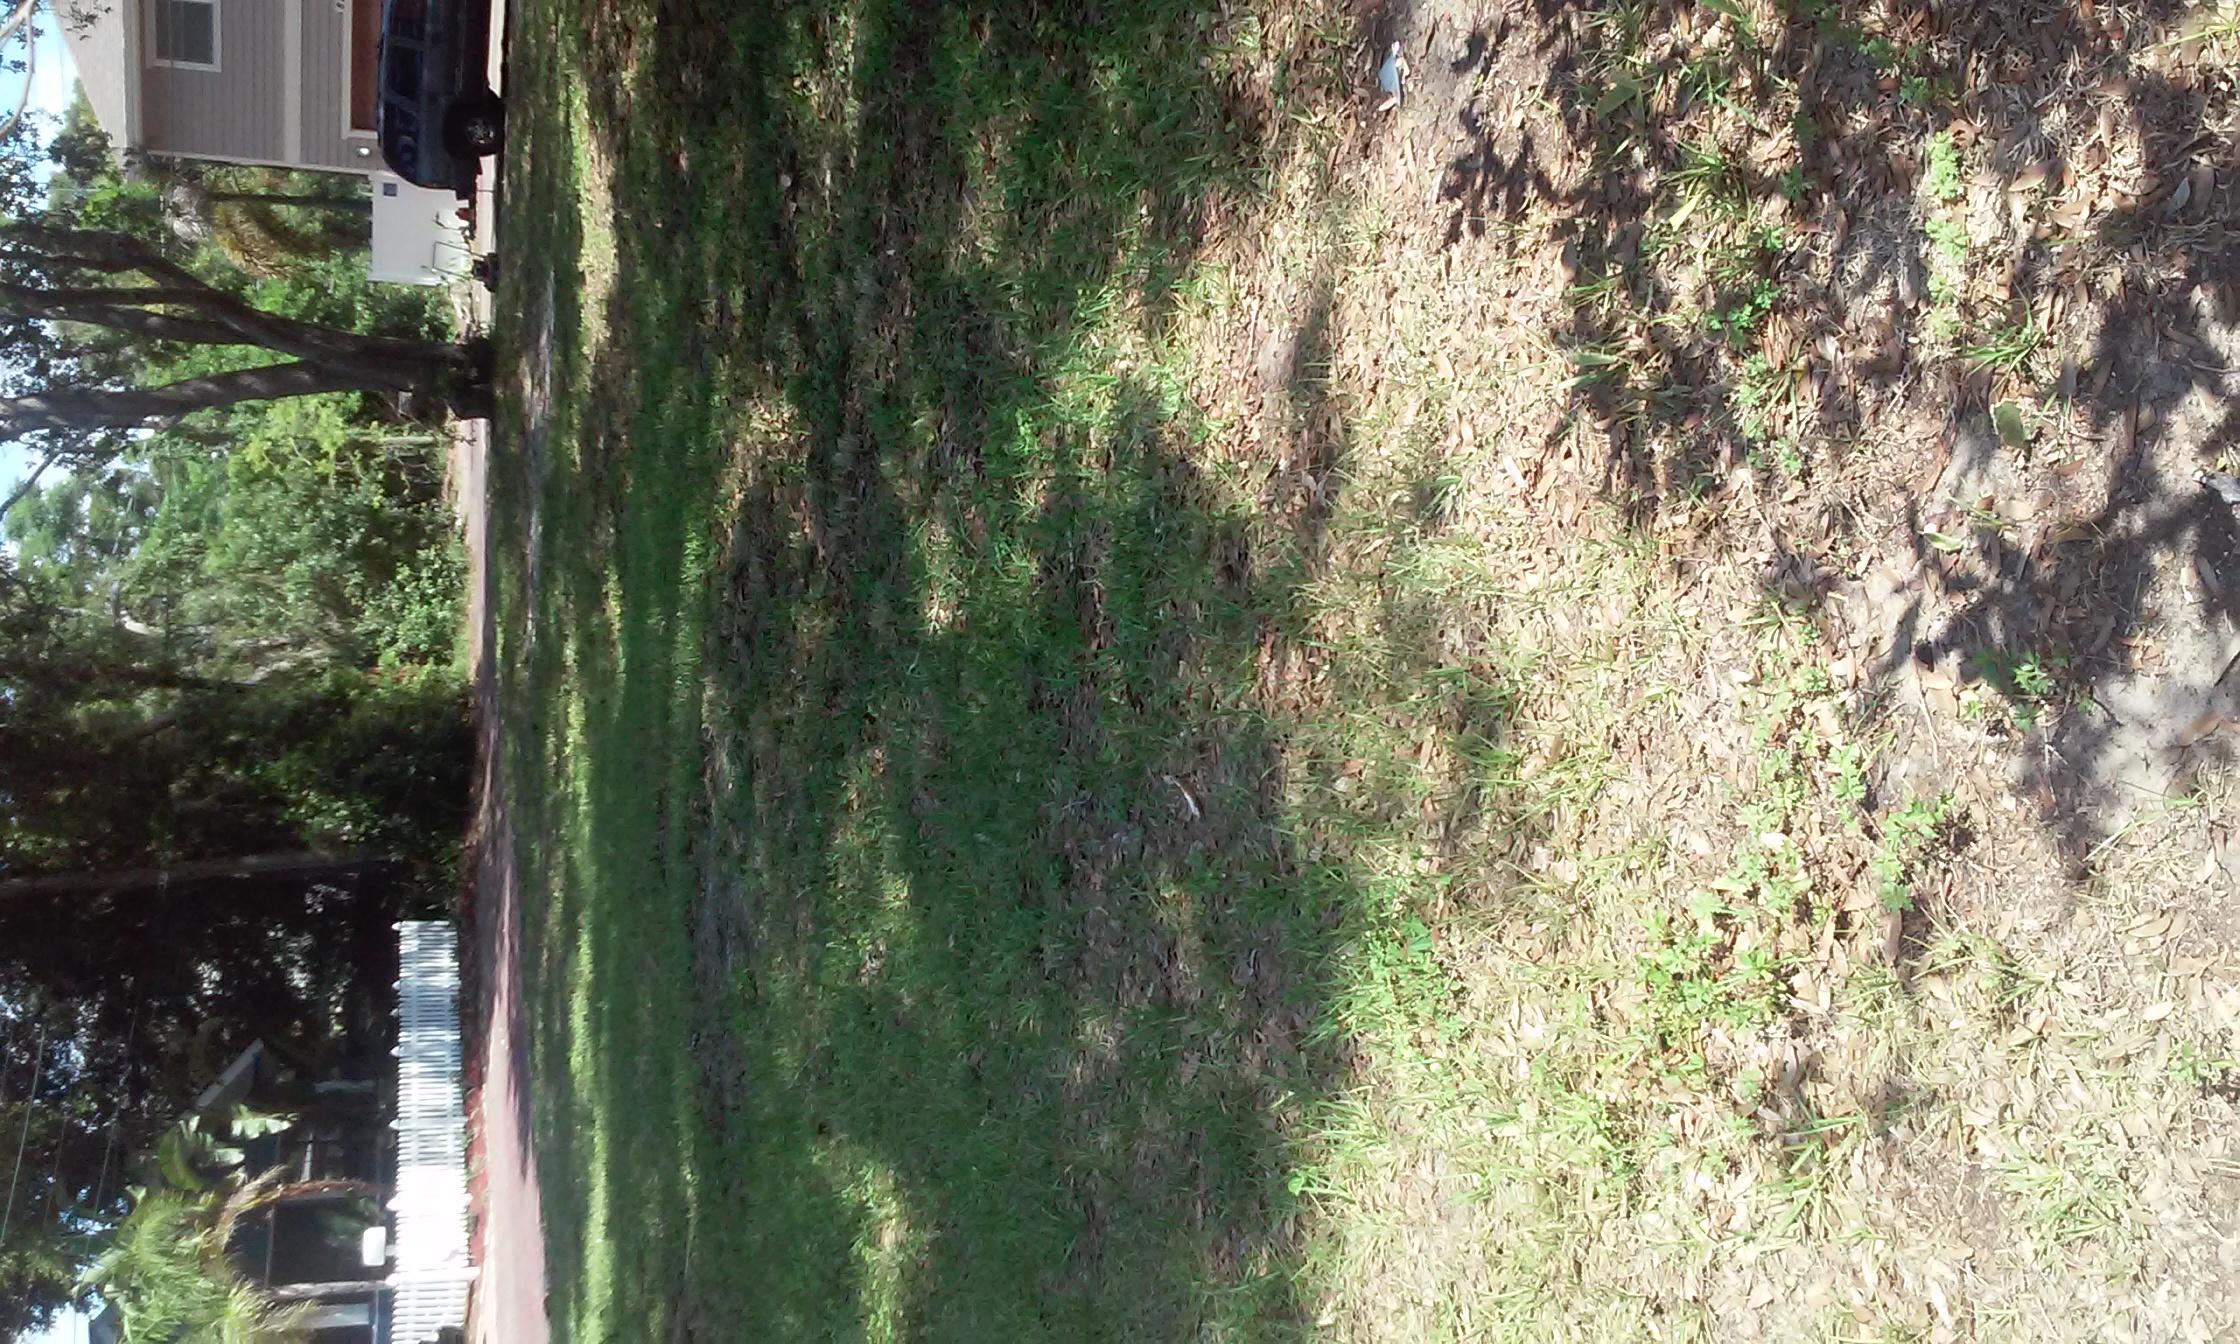 Lawn Care Service in St Petersburg, FL, 33701